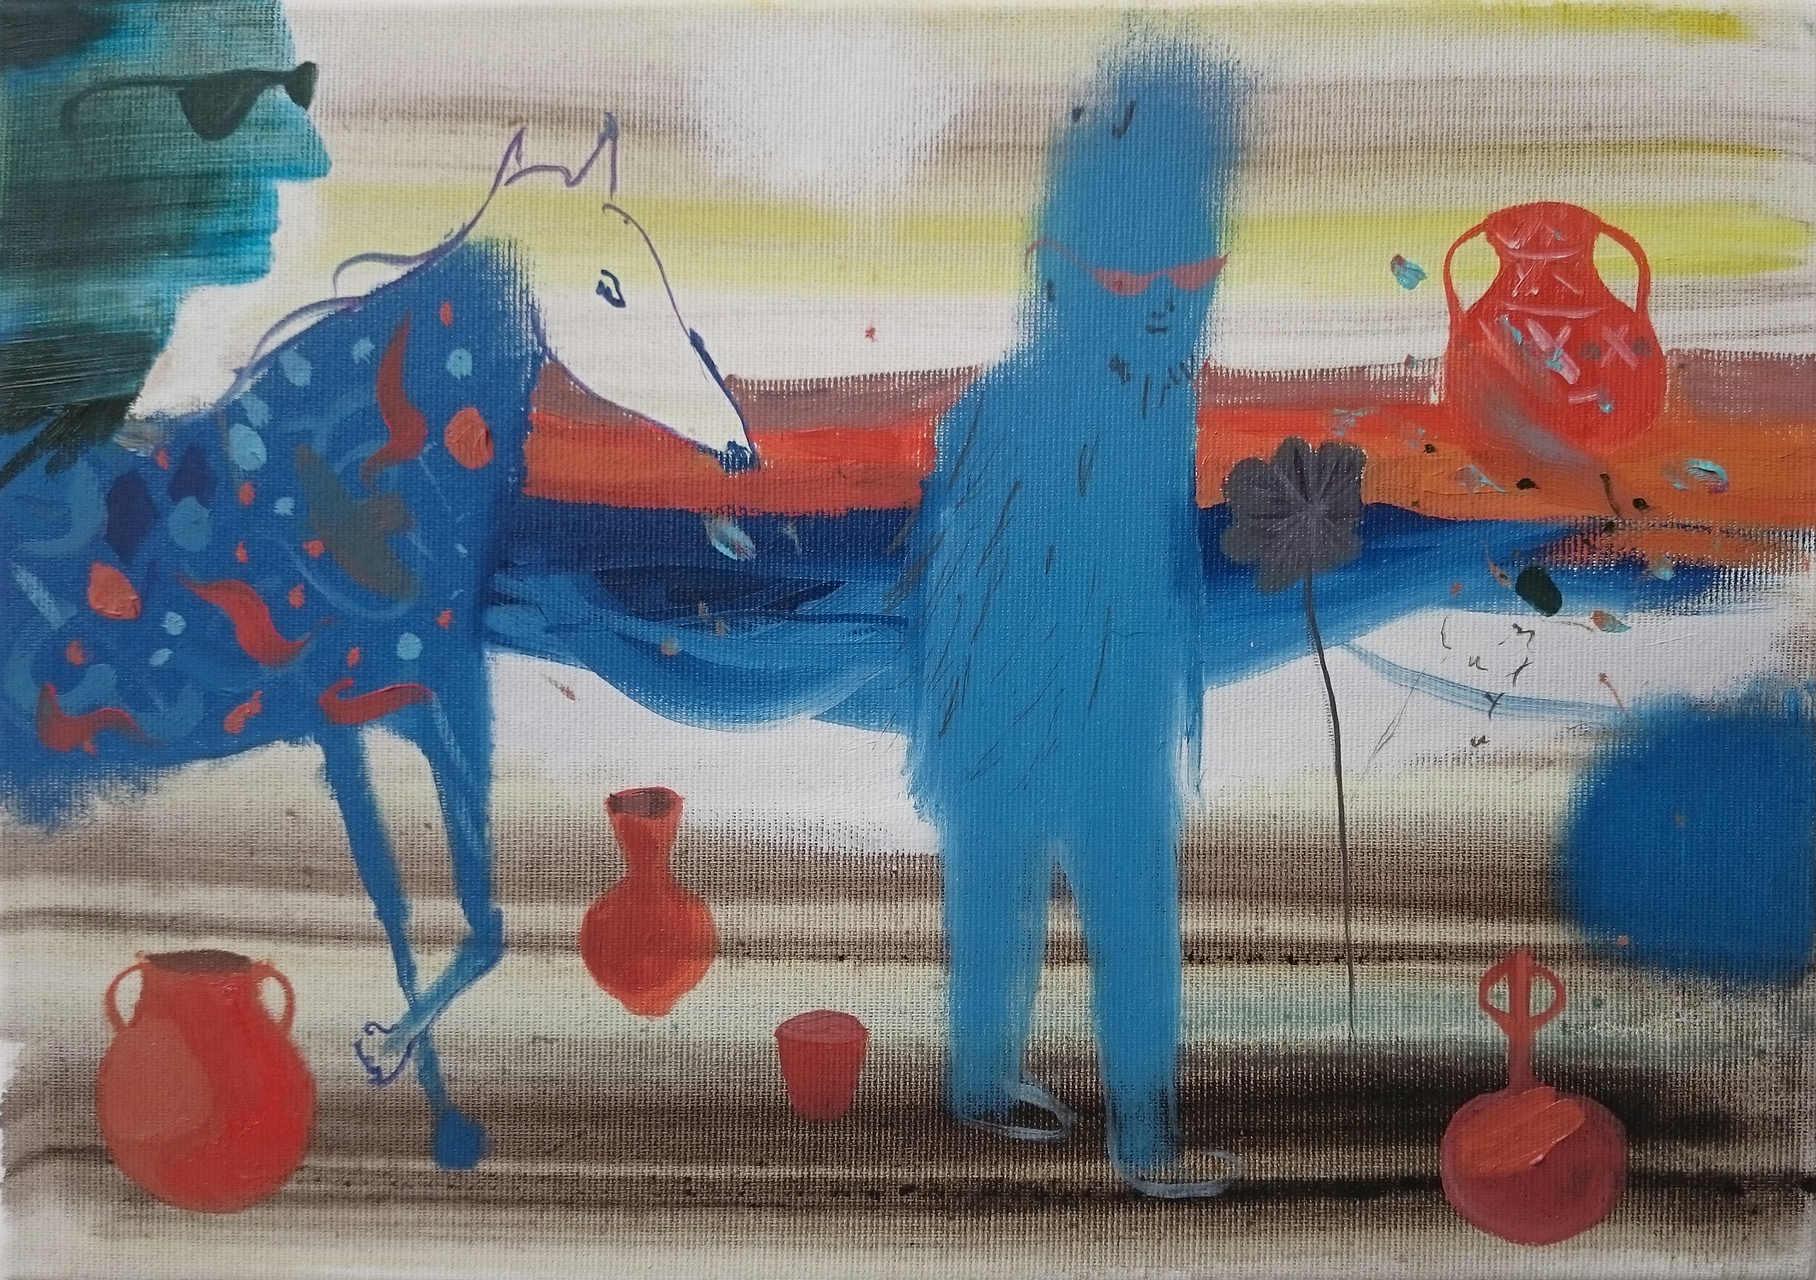 Razvan Botis, C&A [programming language of Mr. Anderson], 2015, oil on canvas, 25 x 35 cm